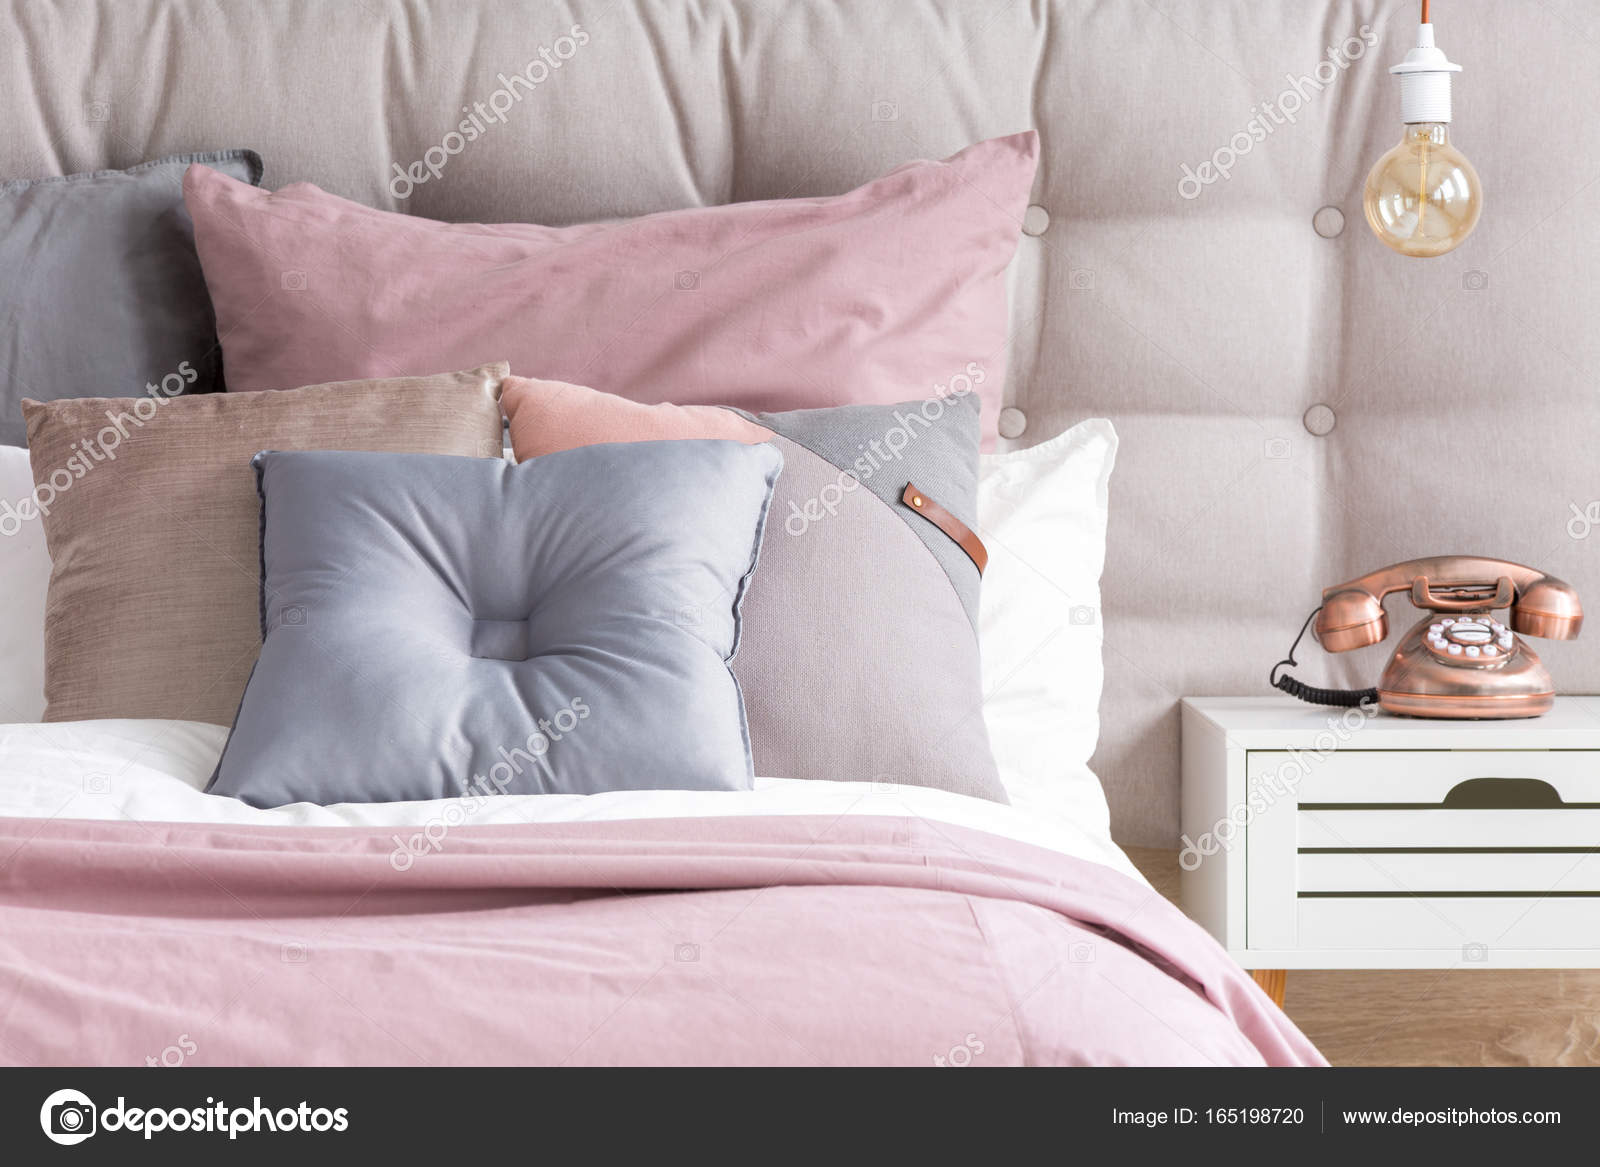 Fantastisch Bett Mit Pastell Farbe Kissen U2014 Stockfoto